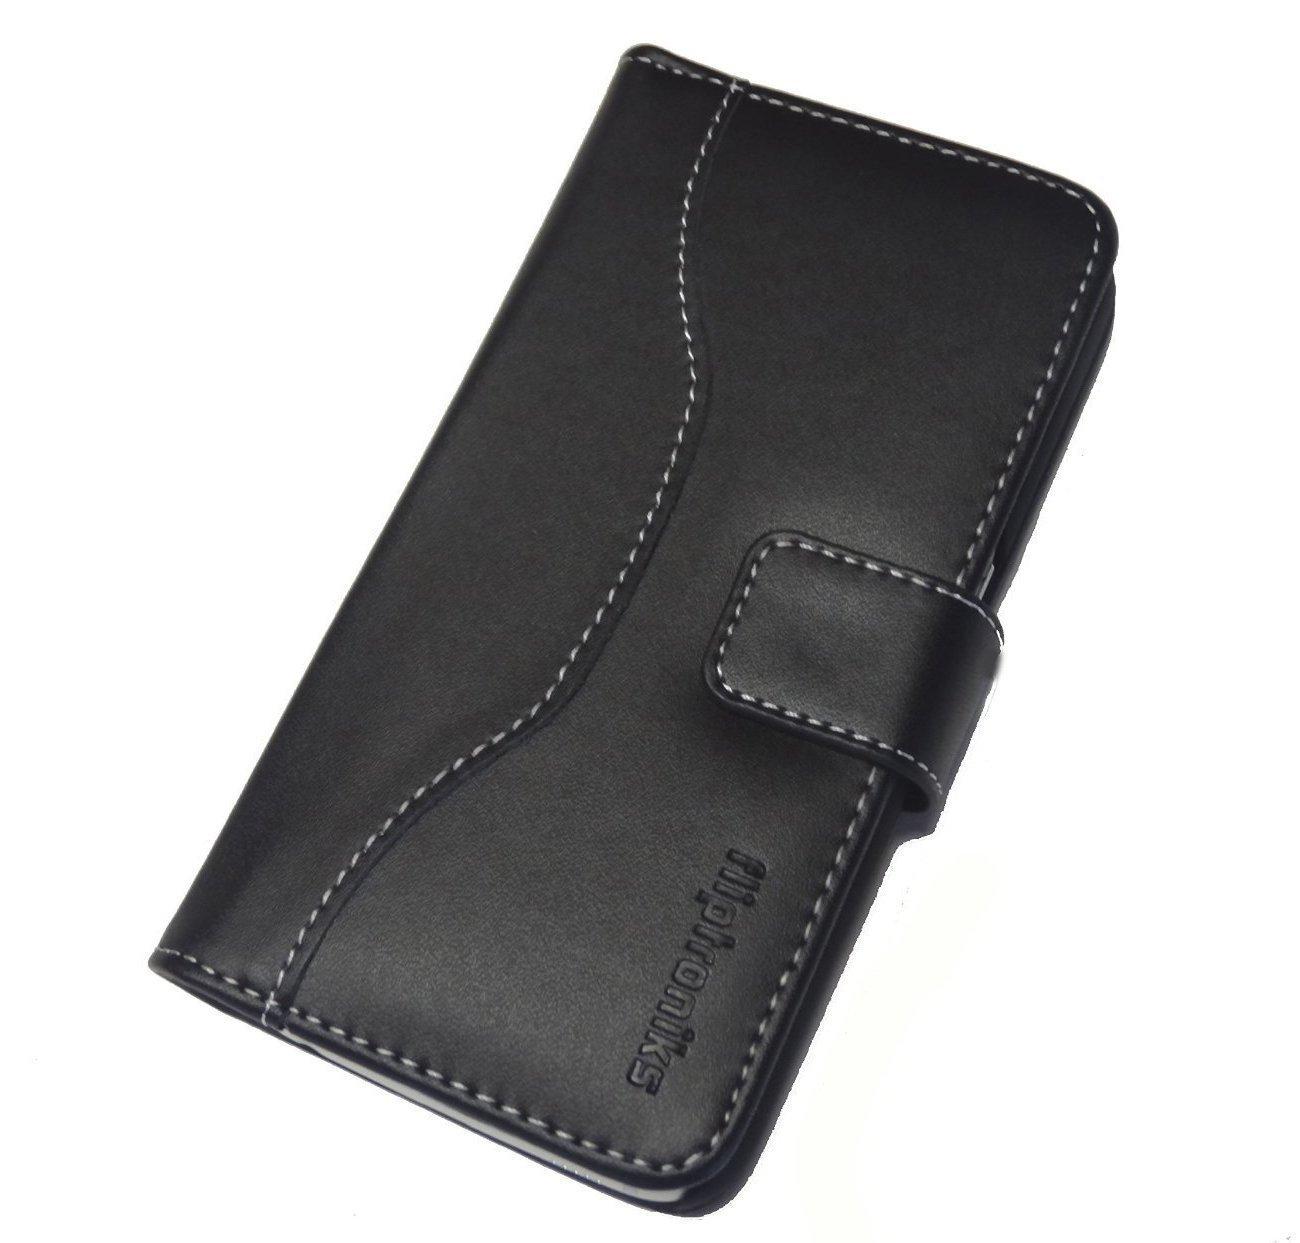 Fliptroniks Galaxy S6 Card Case